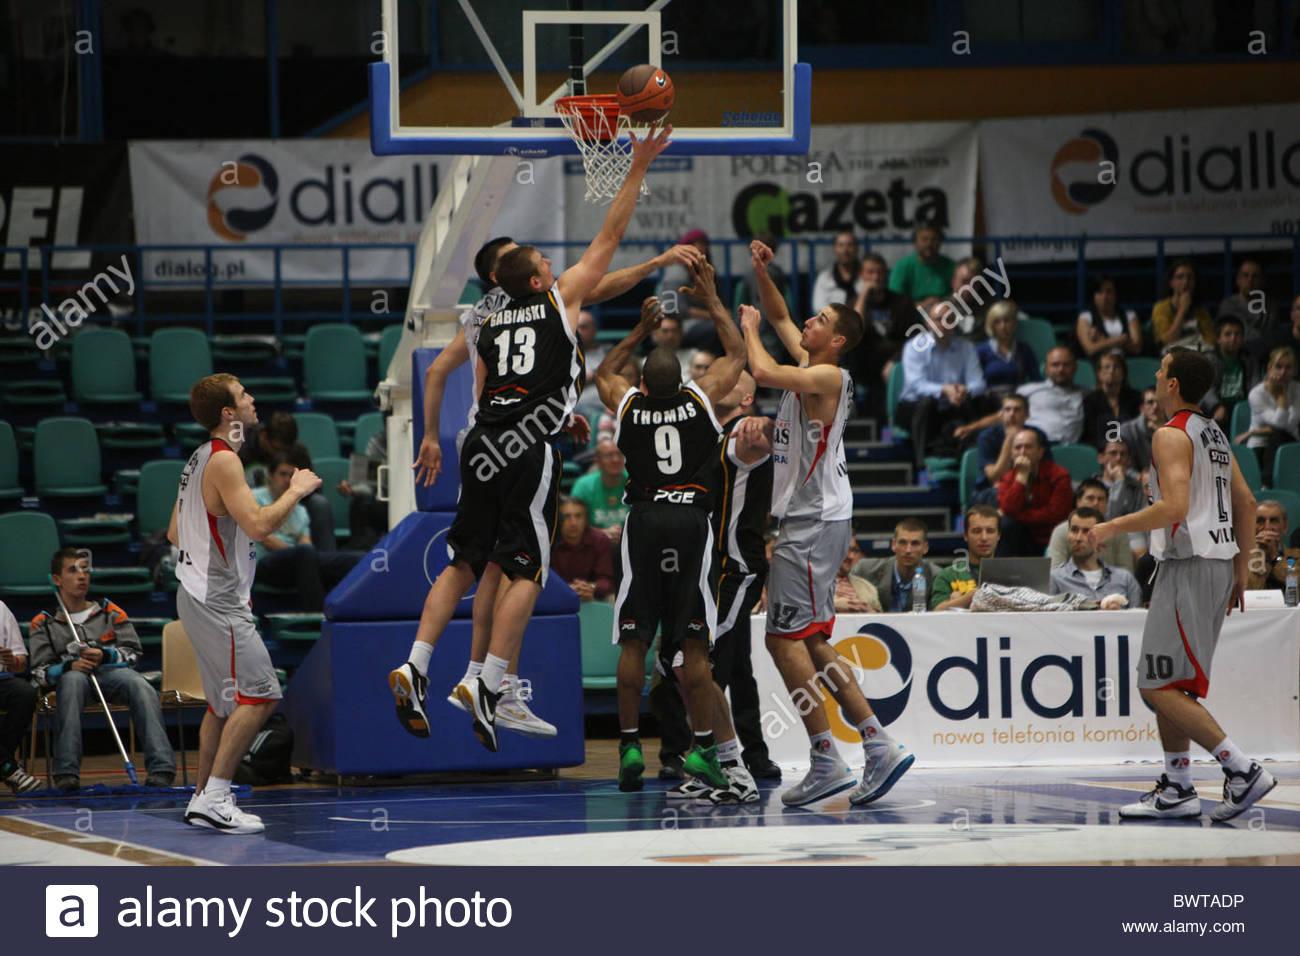 Basketball Imagen De Stock